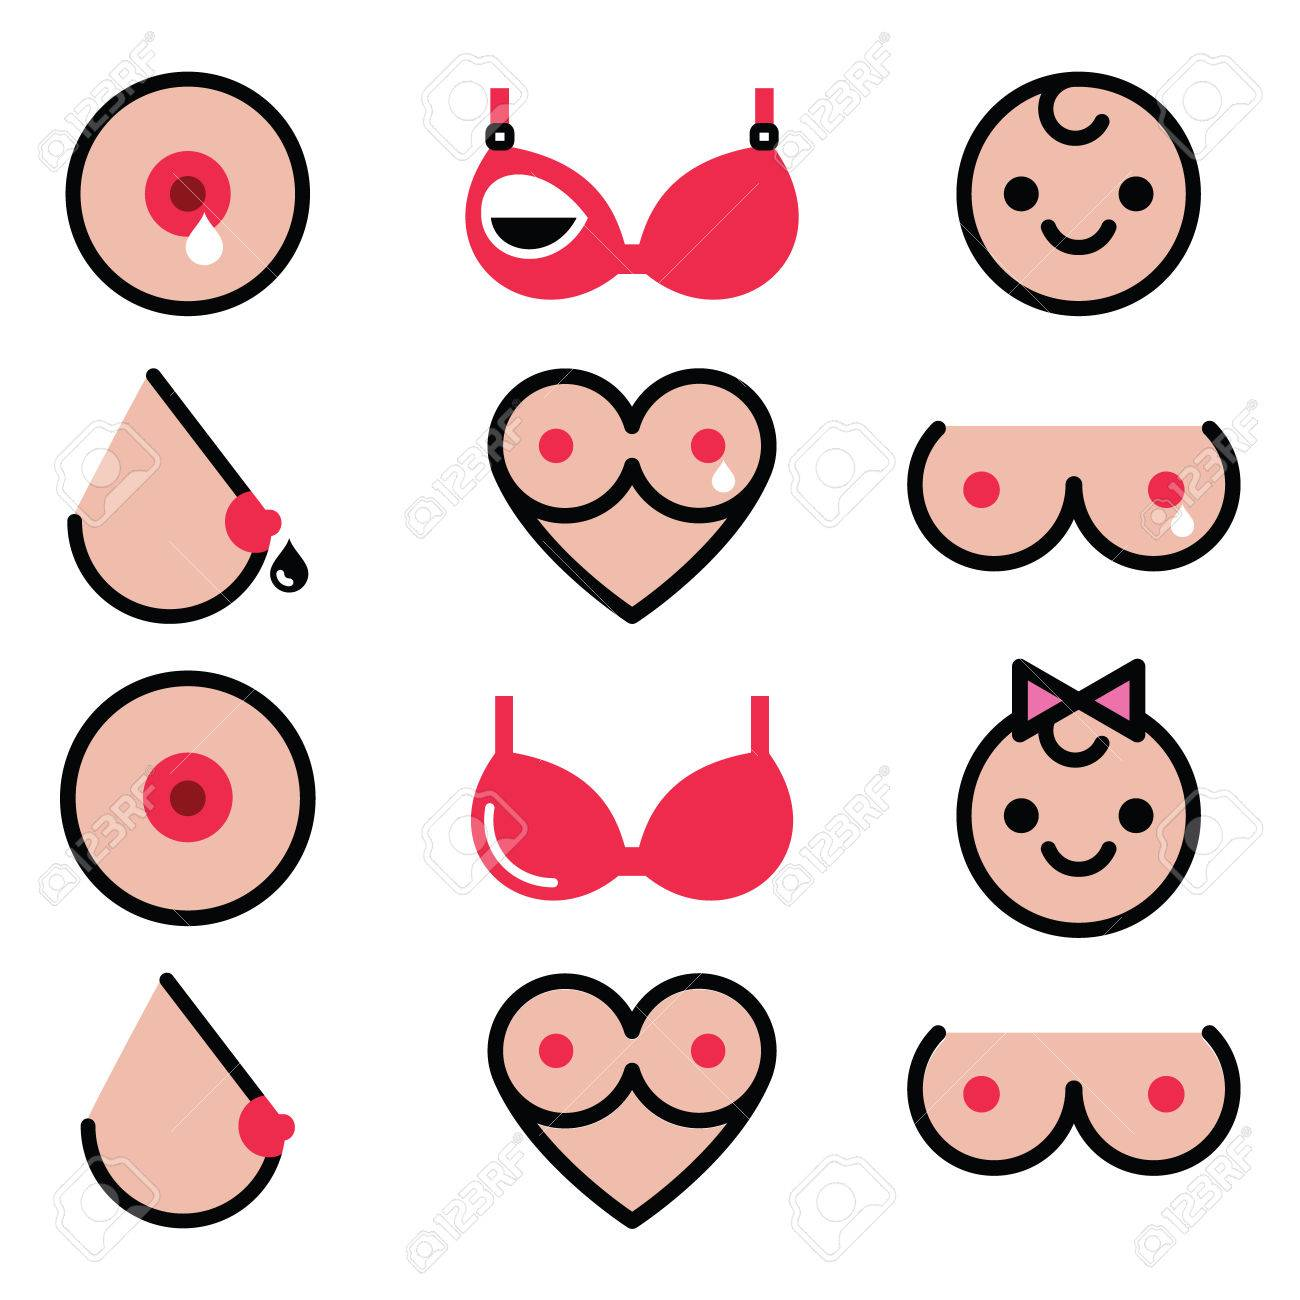 Breastfeeding, lactation, women's colorful icons set - 50046332